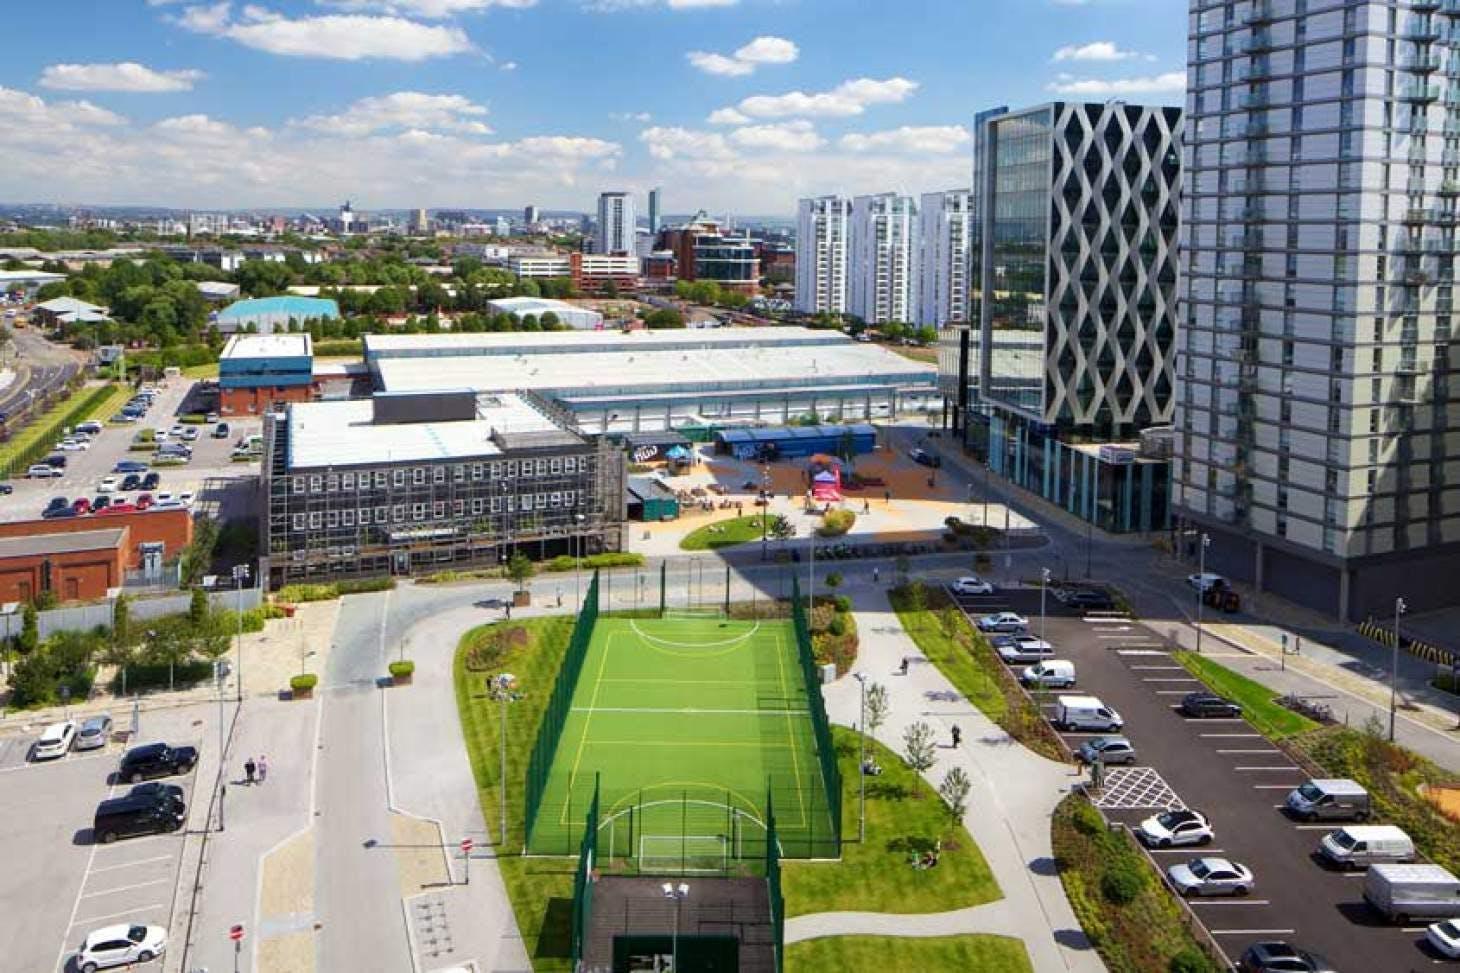 The Pitch - MediaCityUK Outdoor | 3G Astroturf netball court